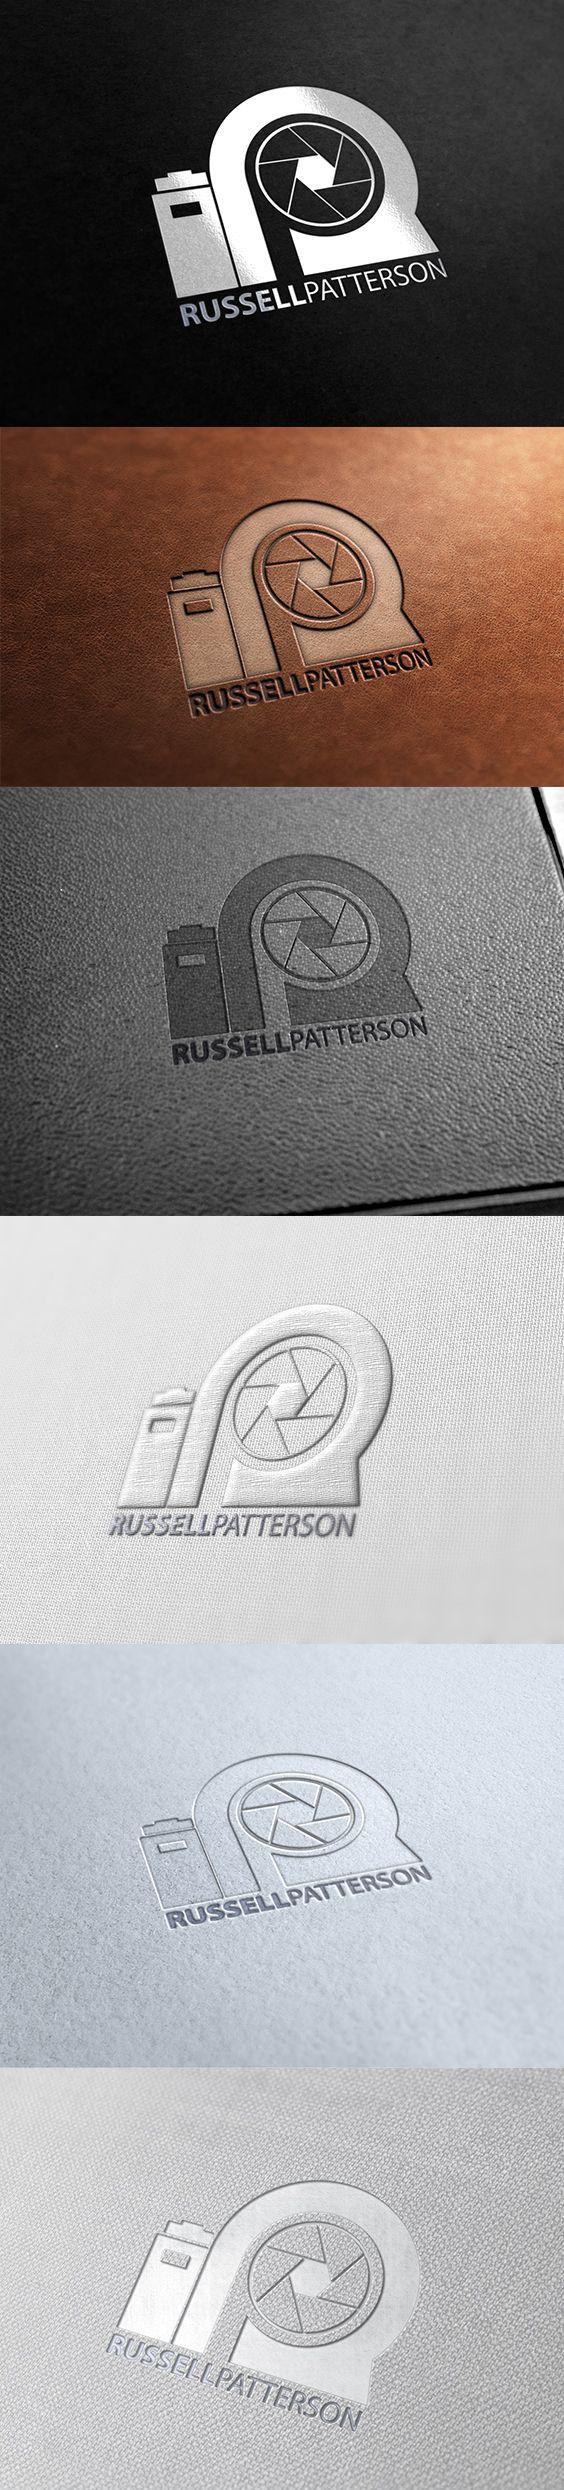 """RP"" Photography Logo Design Template"